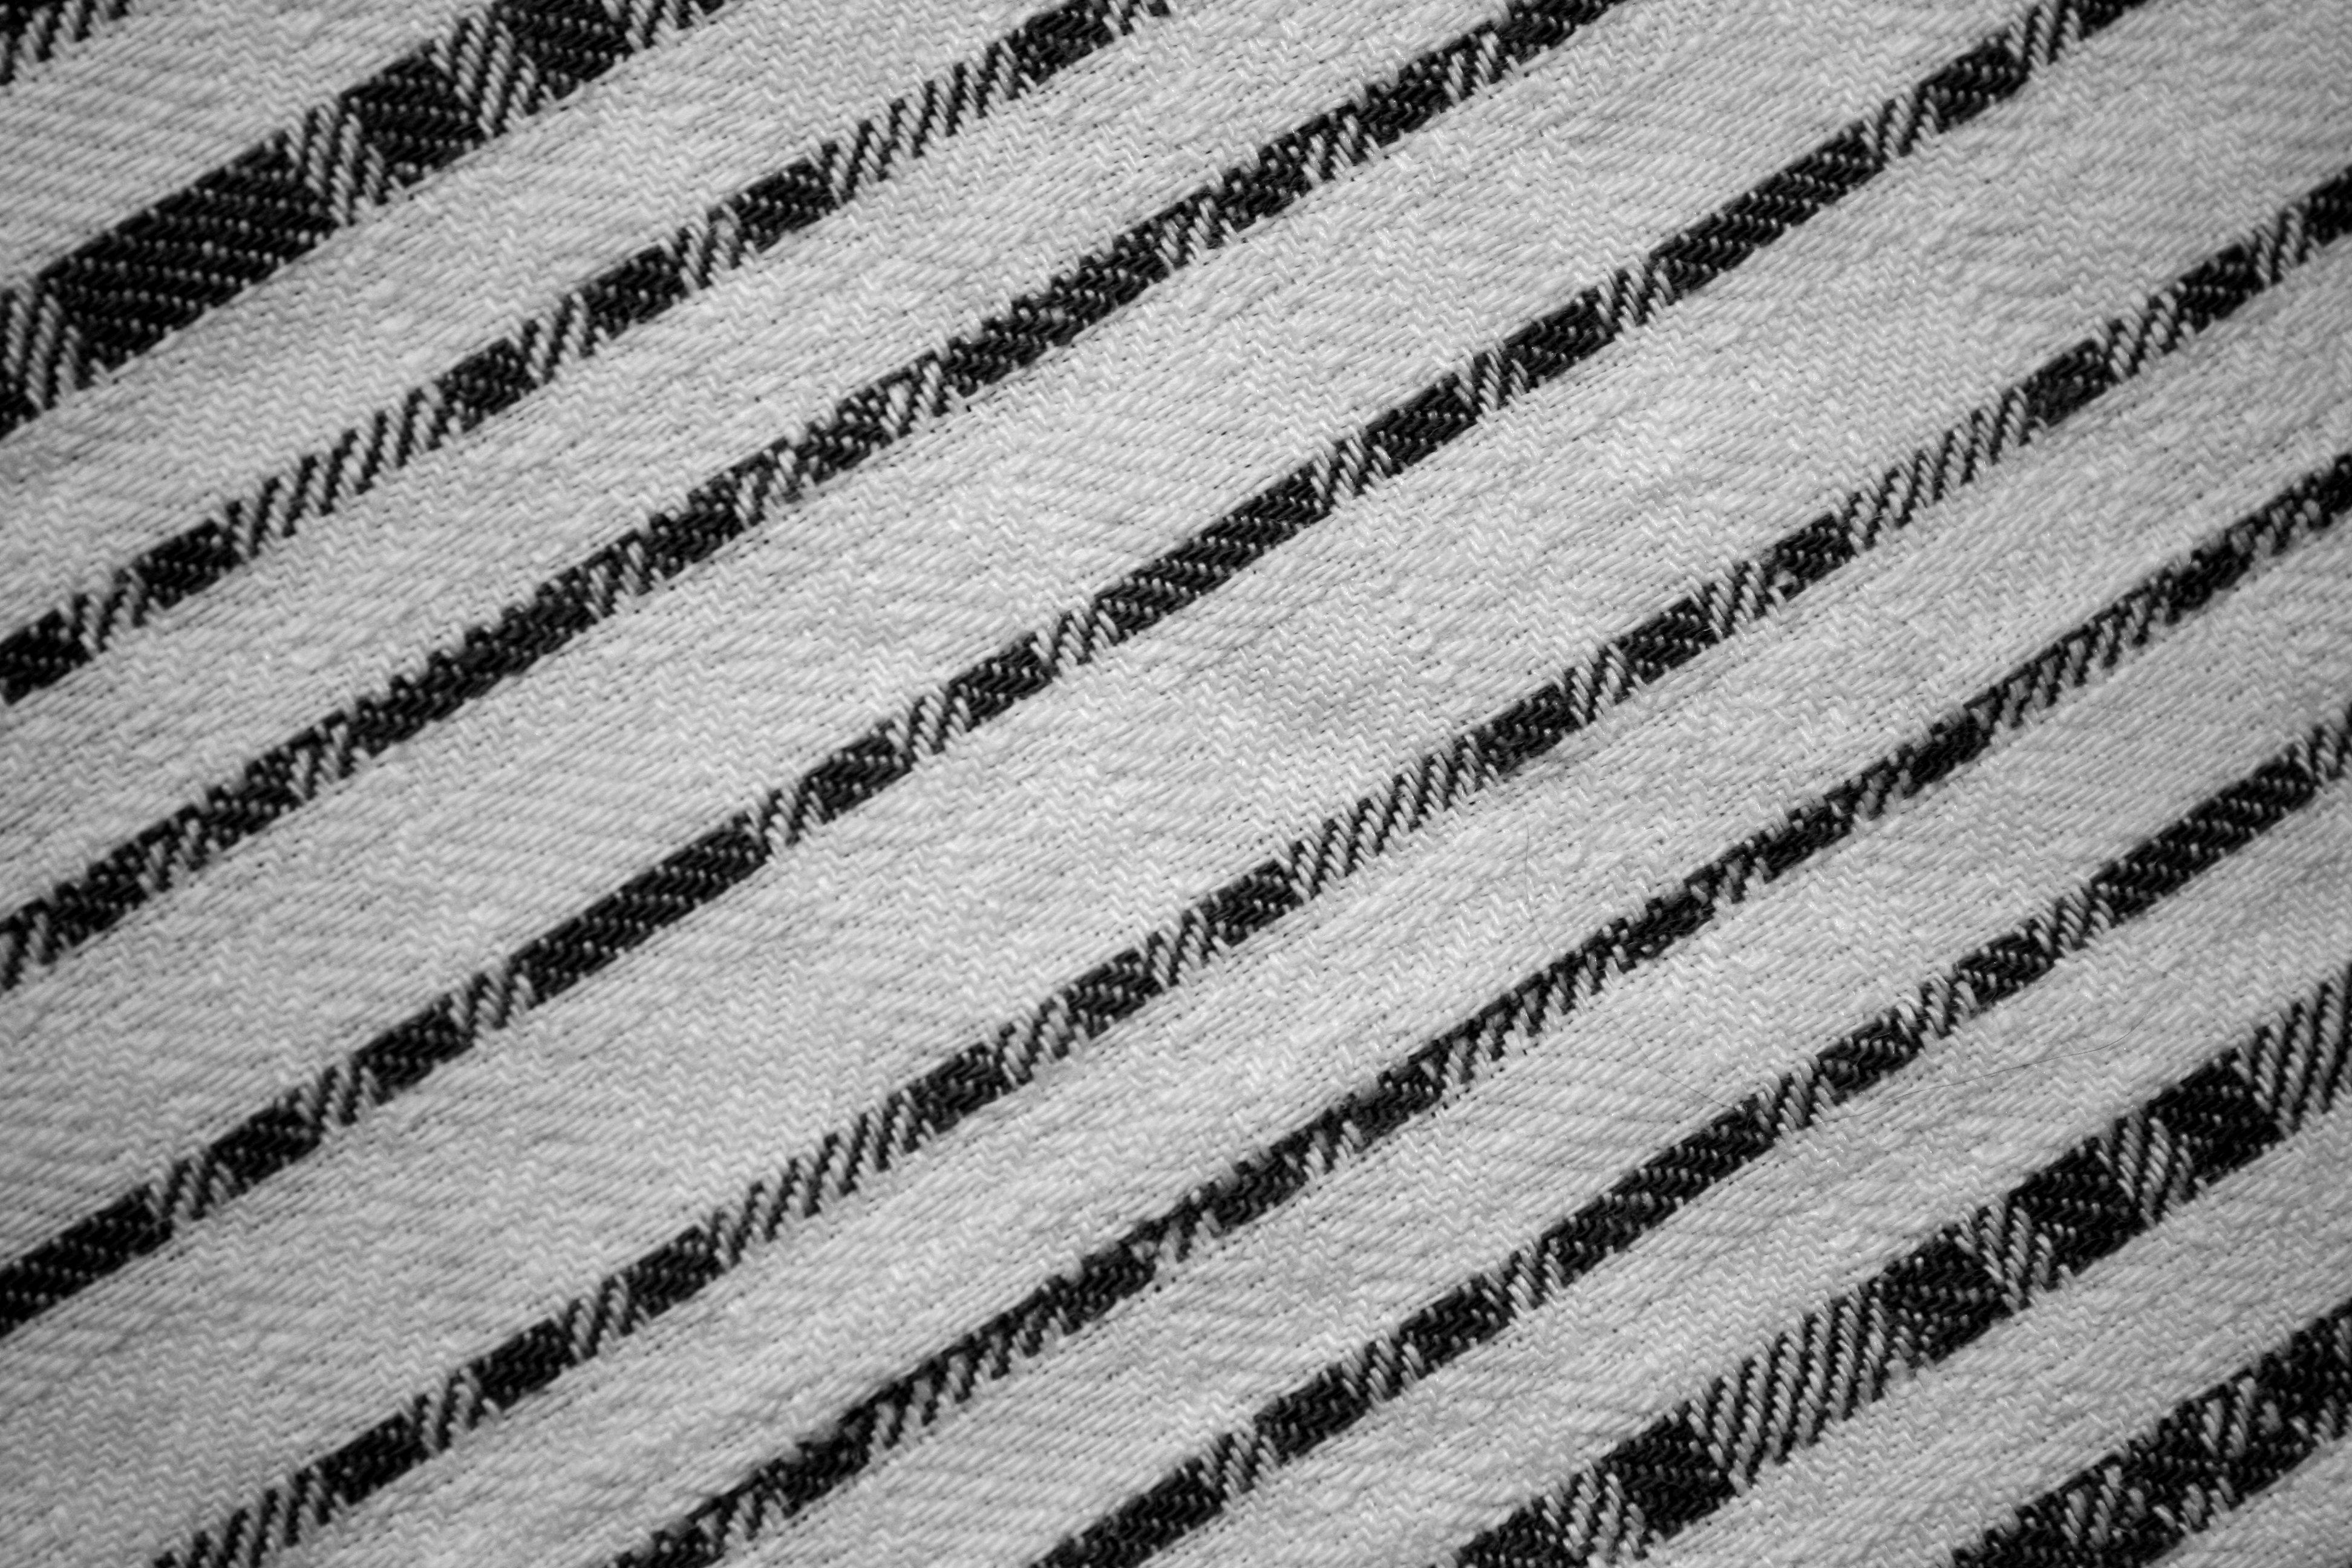 Black On White Diagonal Stripes Fabric Texture Picture